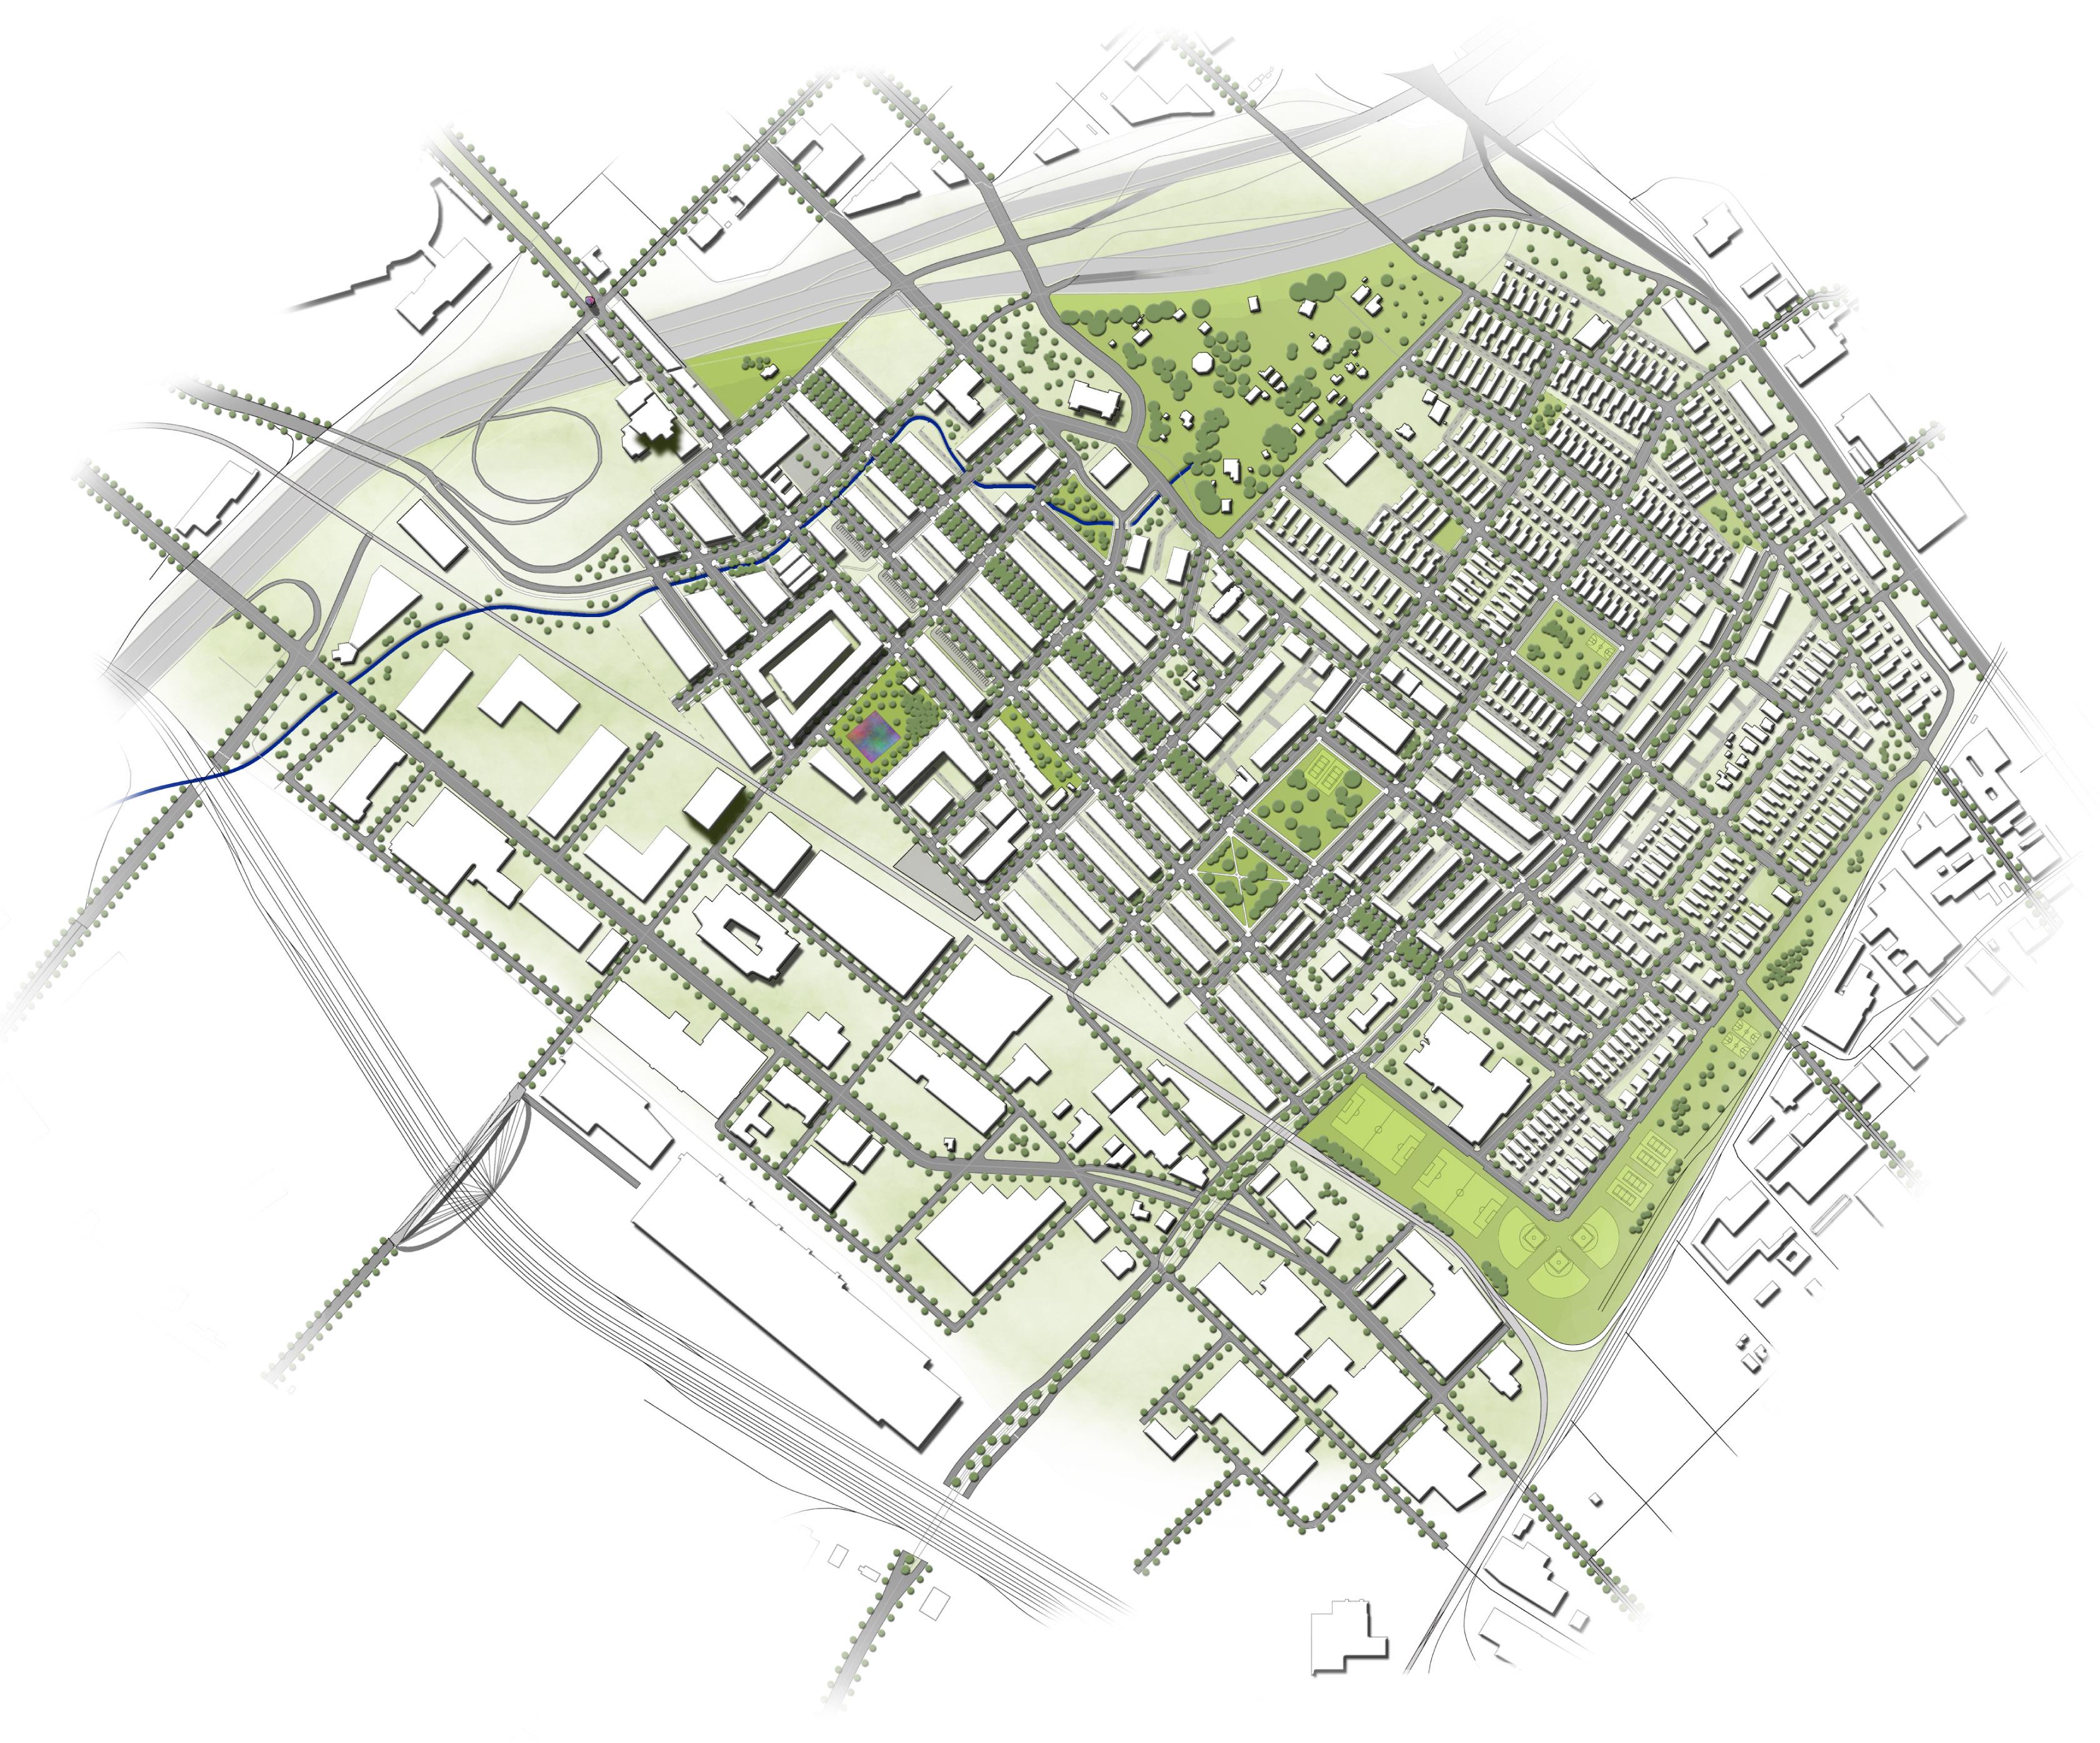 imagiNATIVEamerica.com » ULI Urban Design Competition 2009